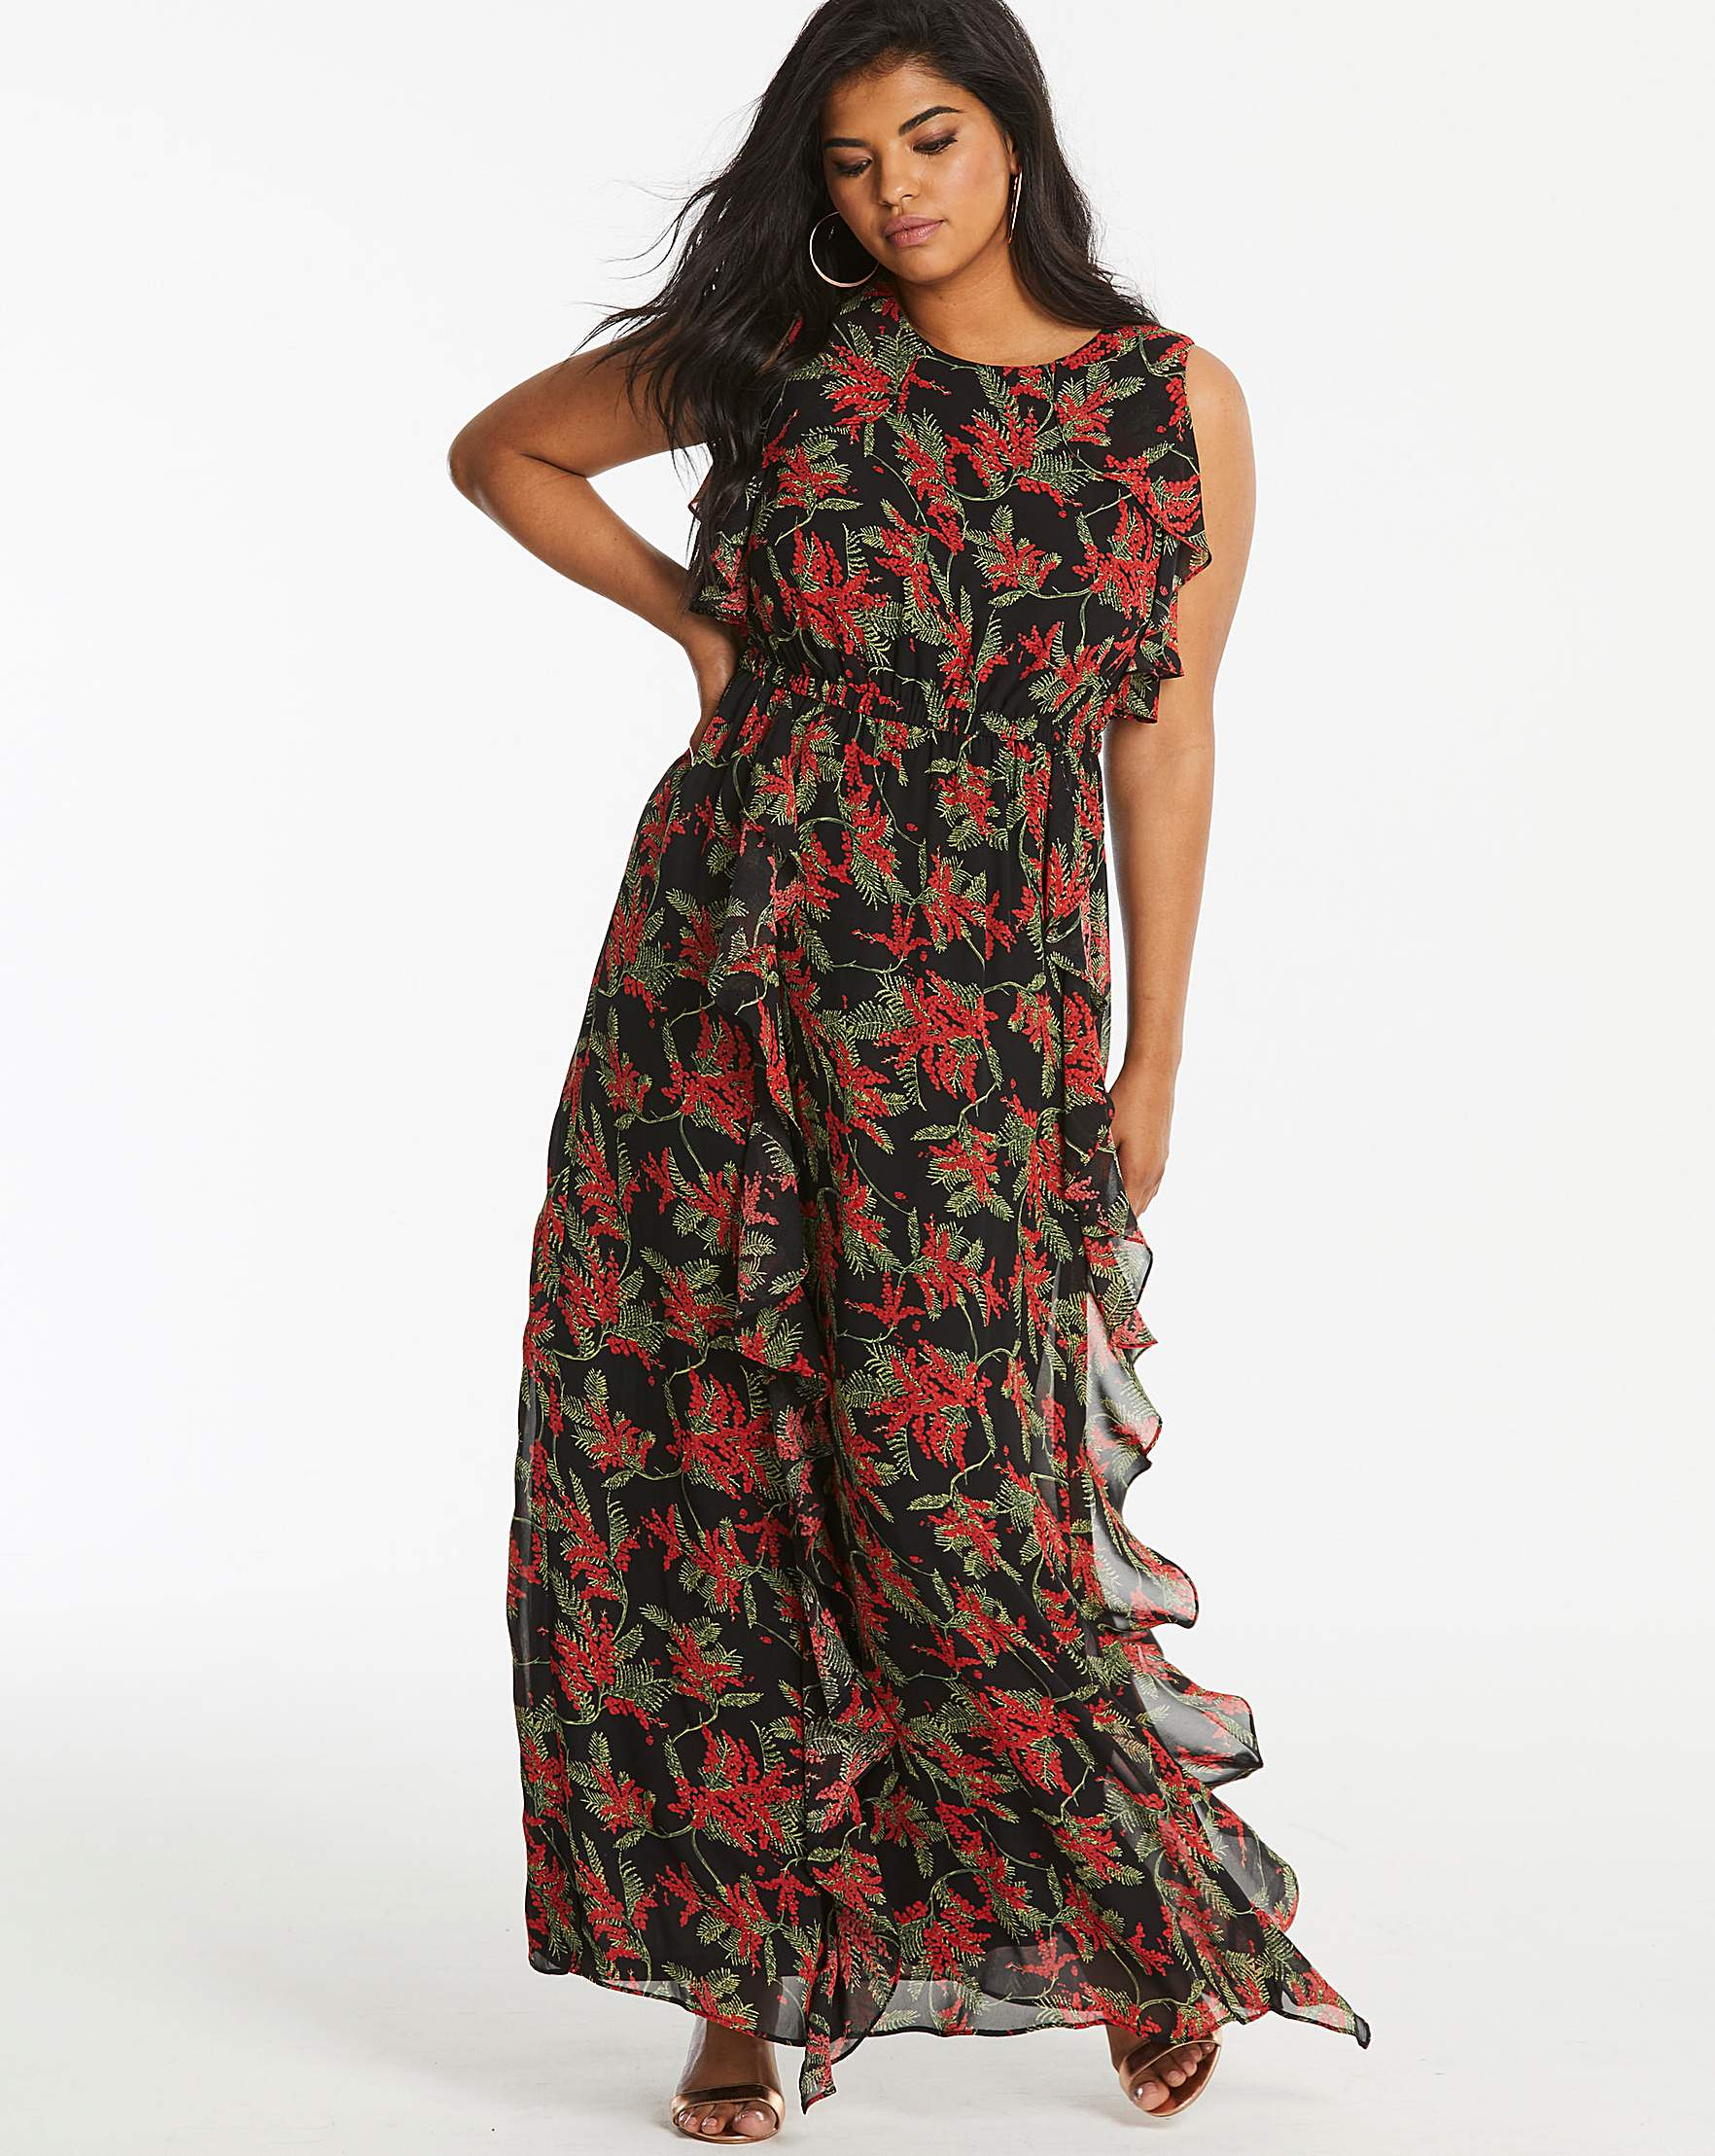 6137d266458d0 Lovedrobe Frill Maxi Dress